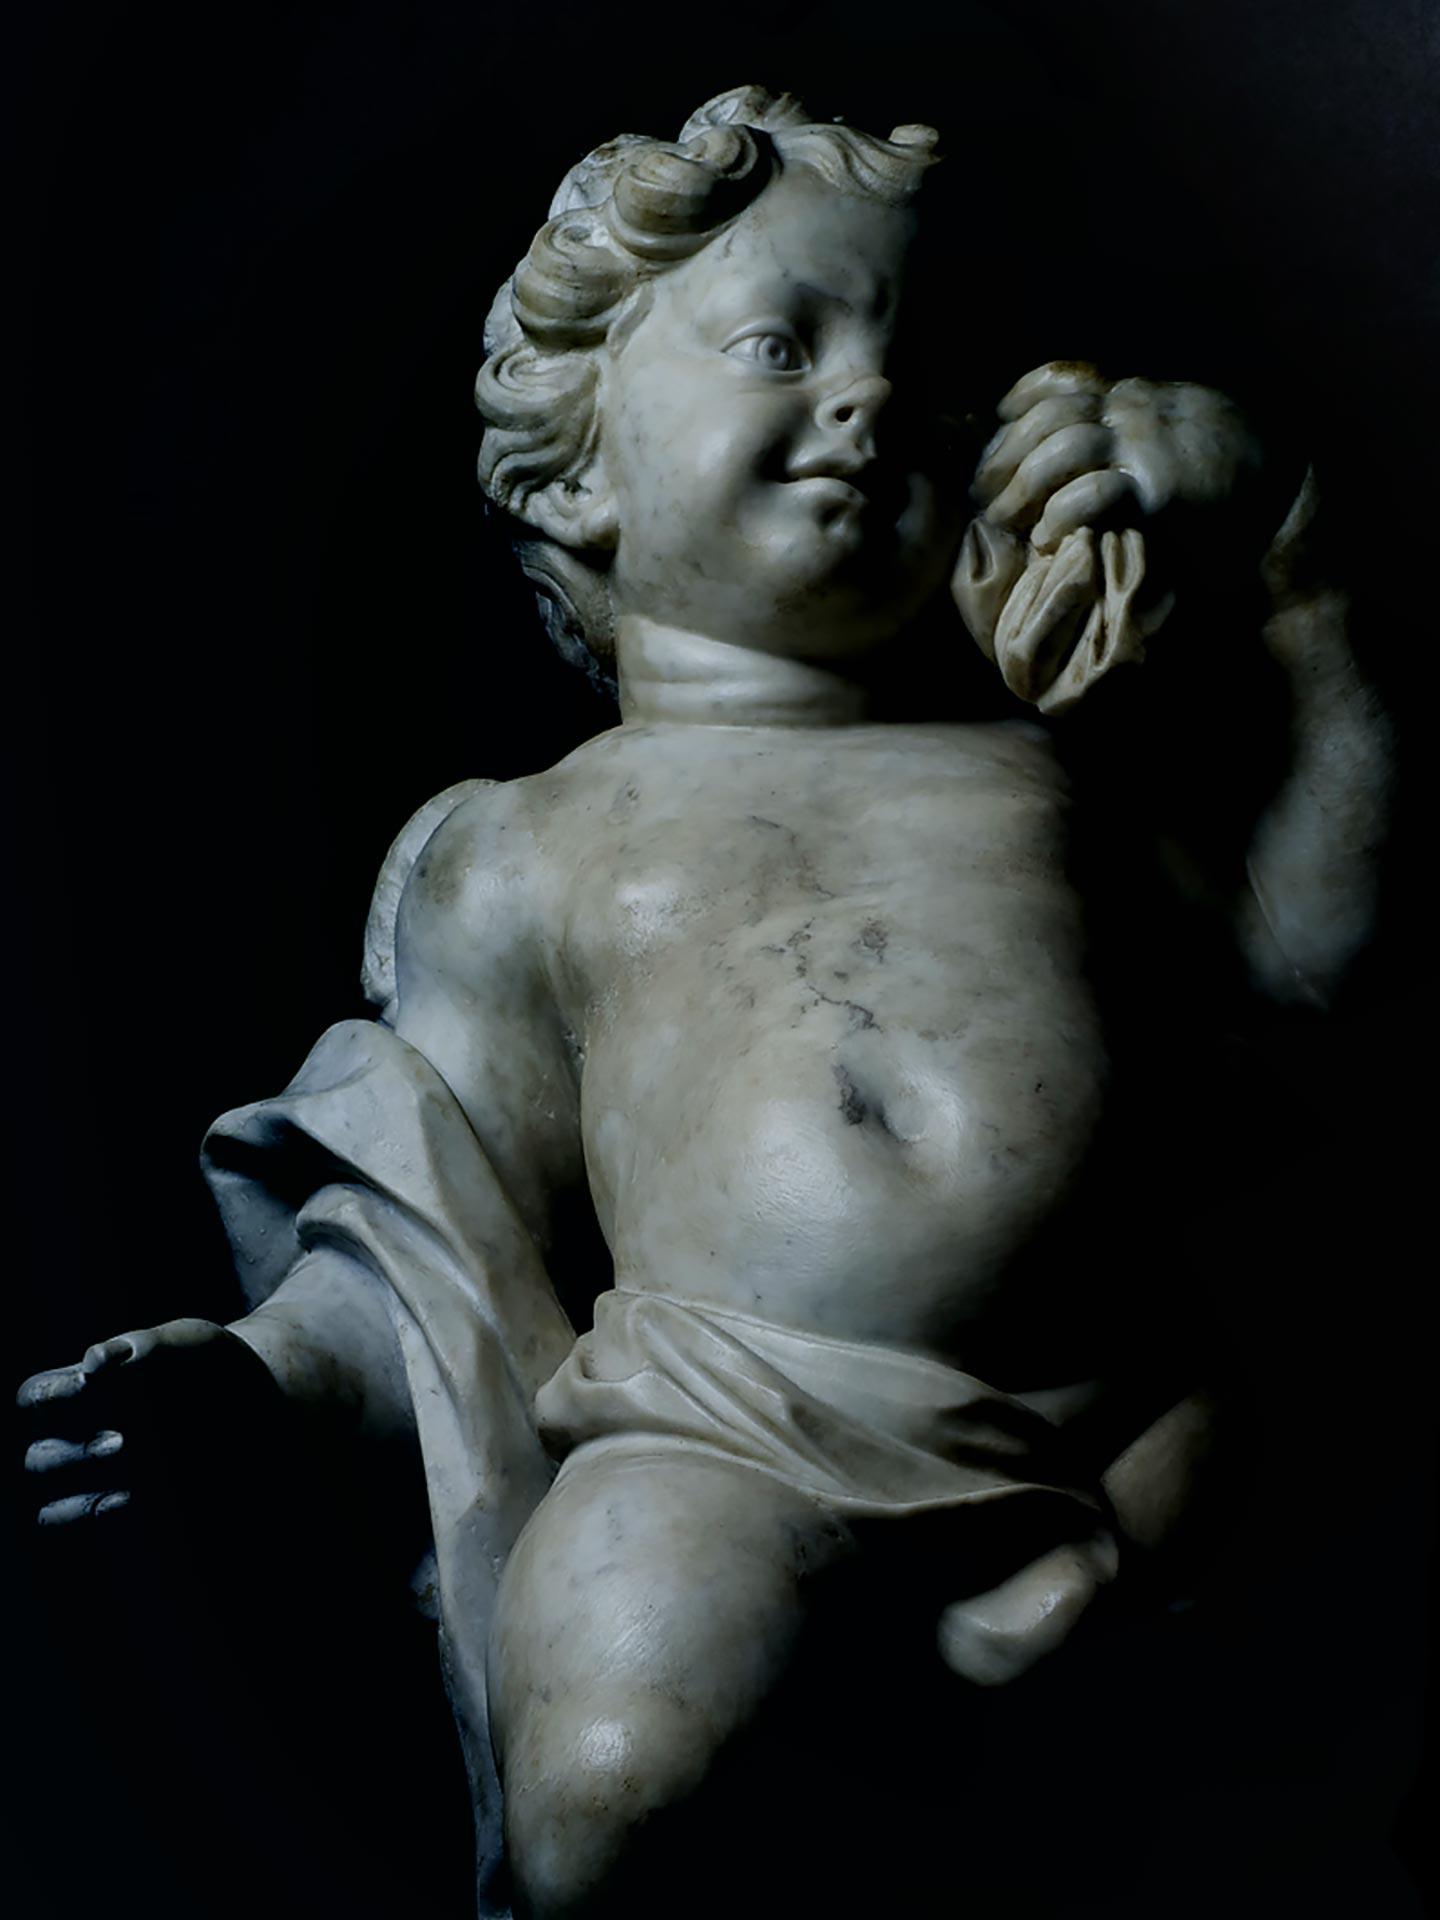 Cherub from Private Collection, Baroque Art, 18th Century